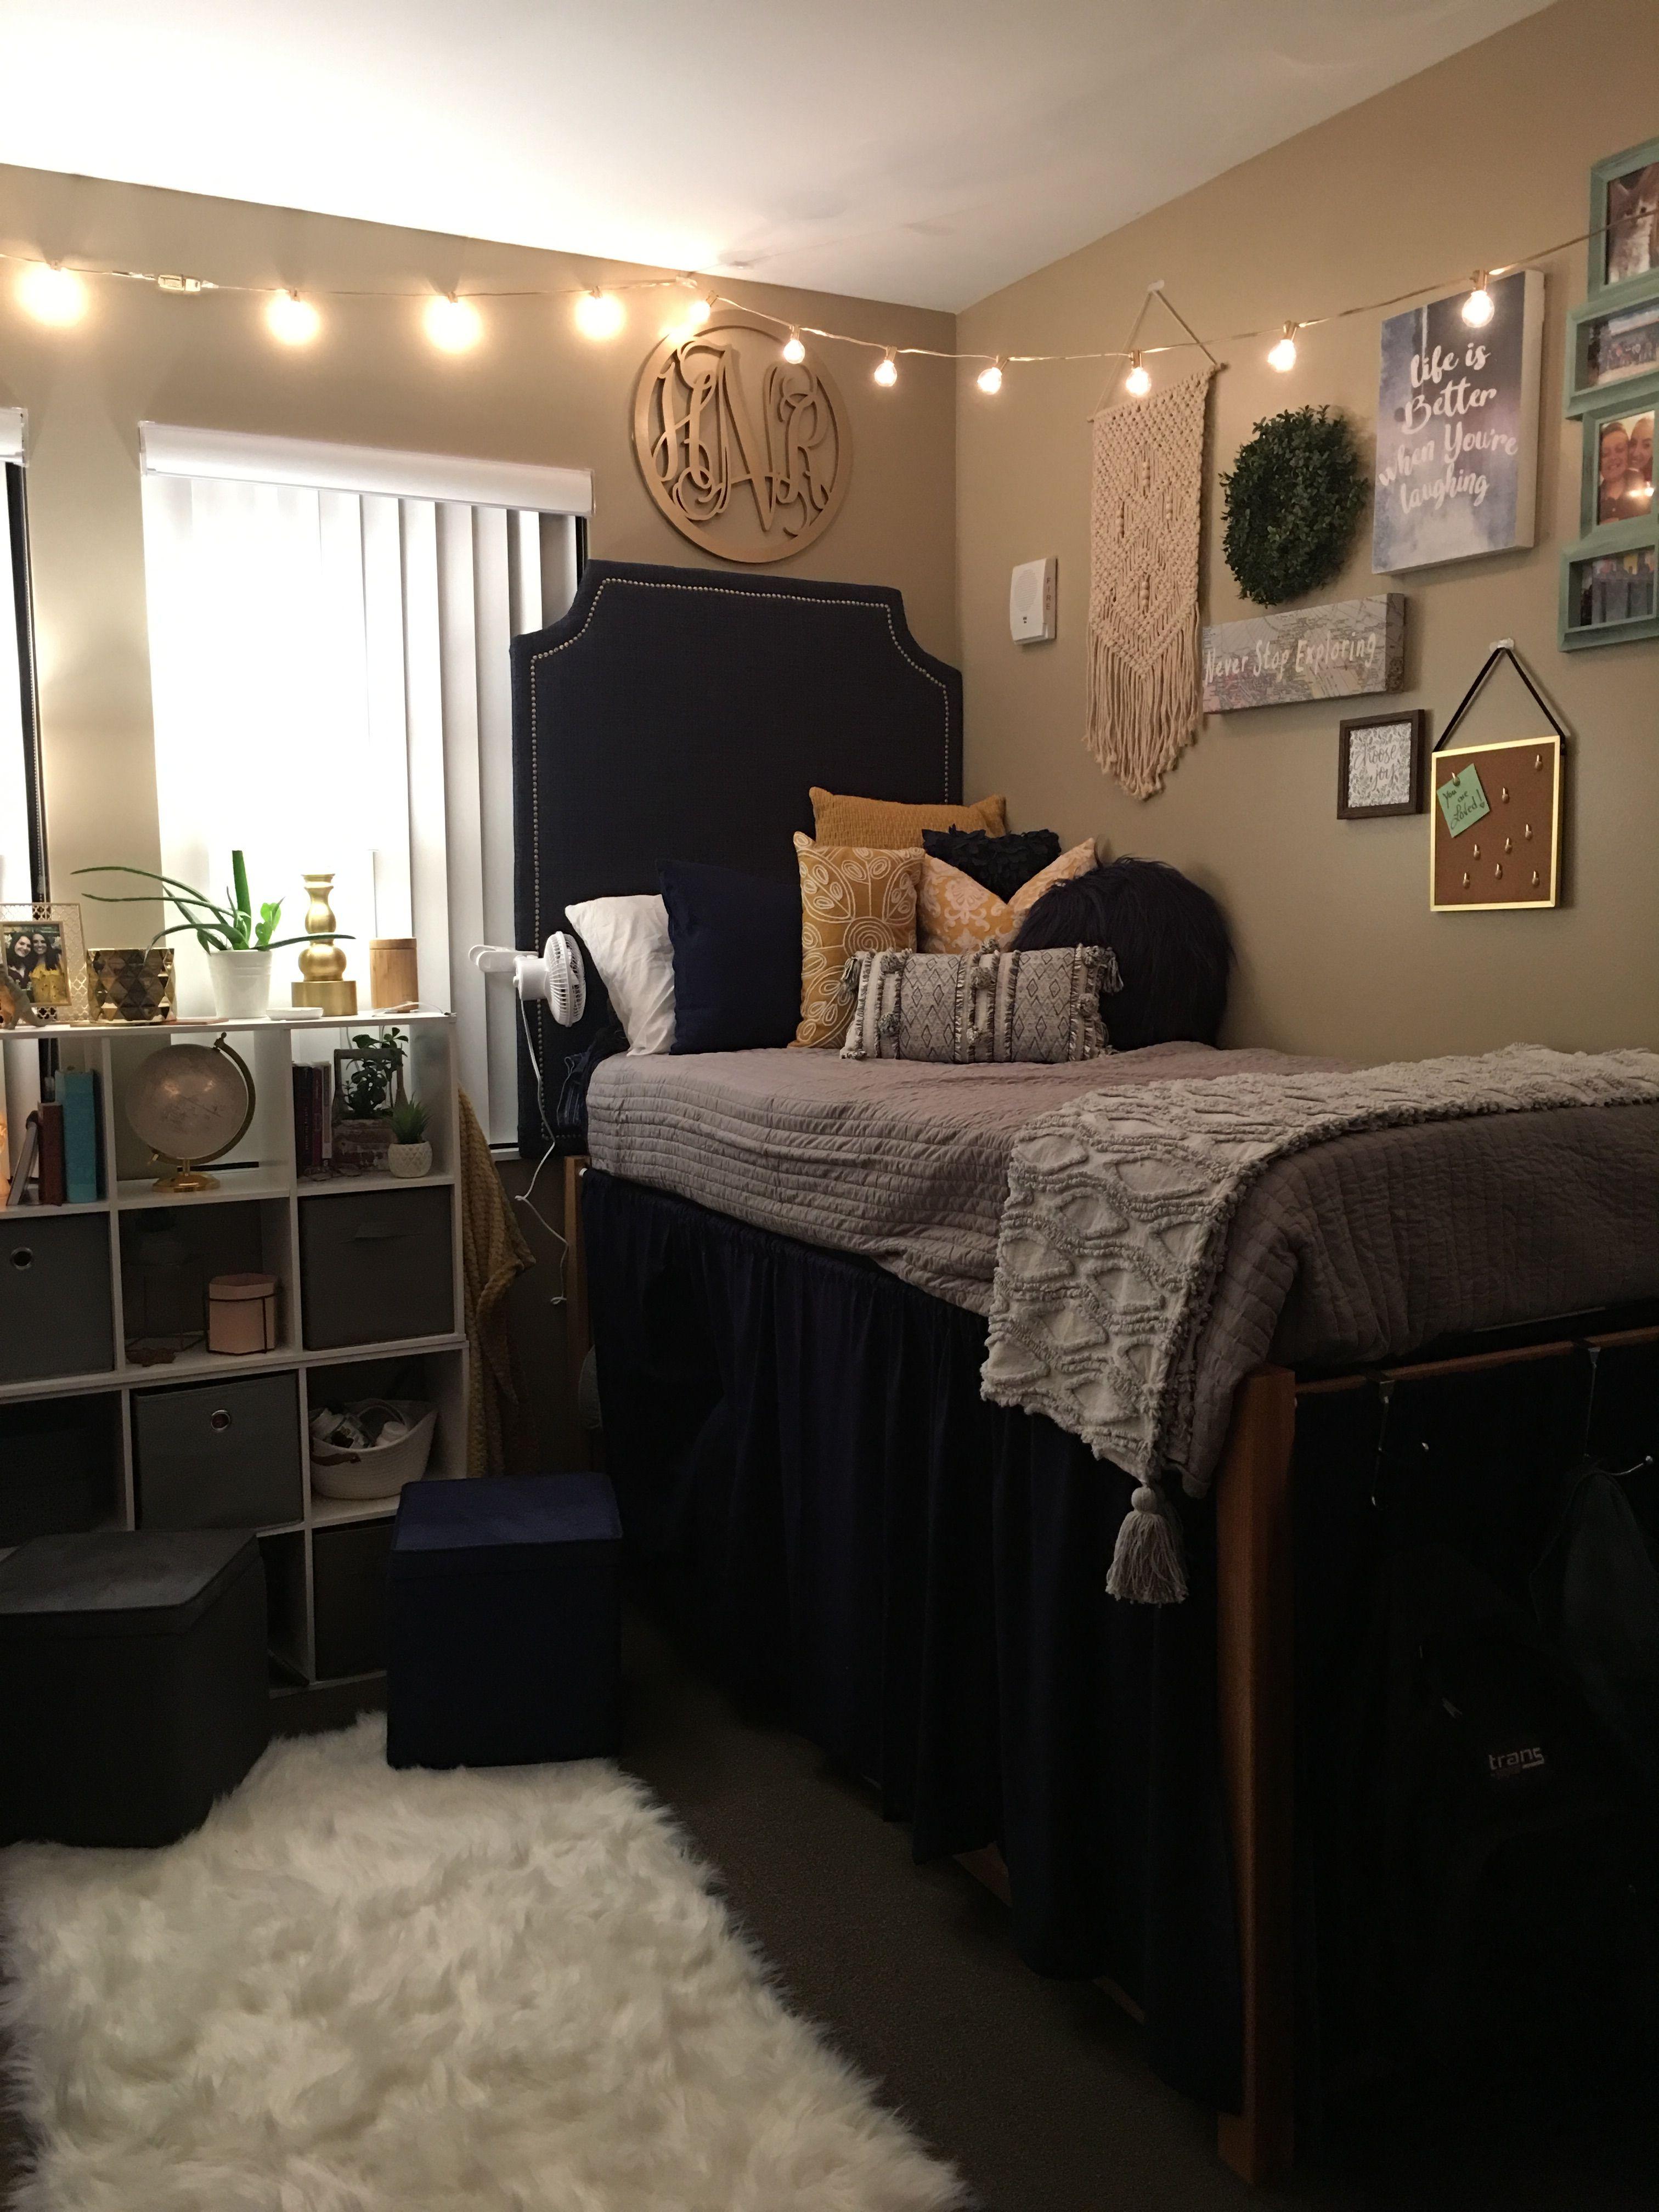 Dorm Room Color Schemes